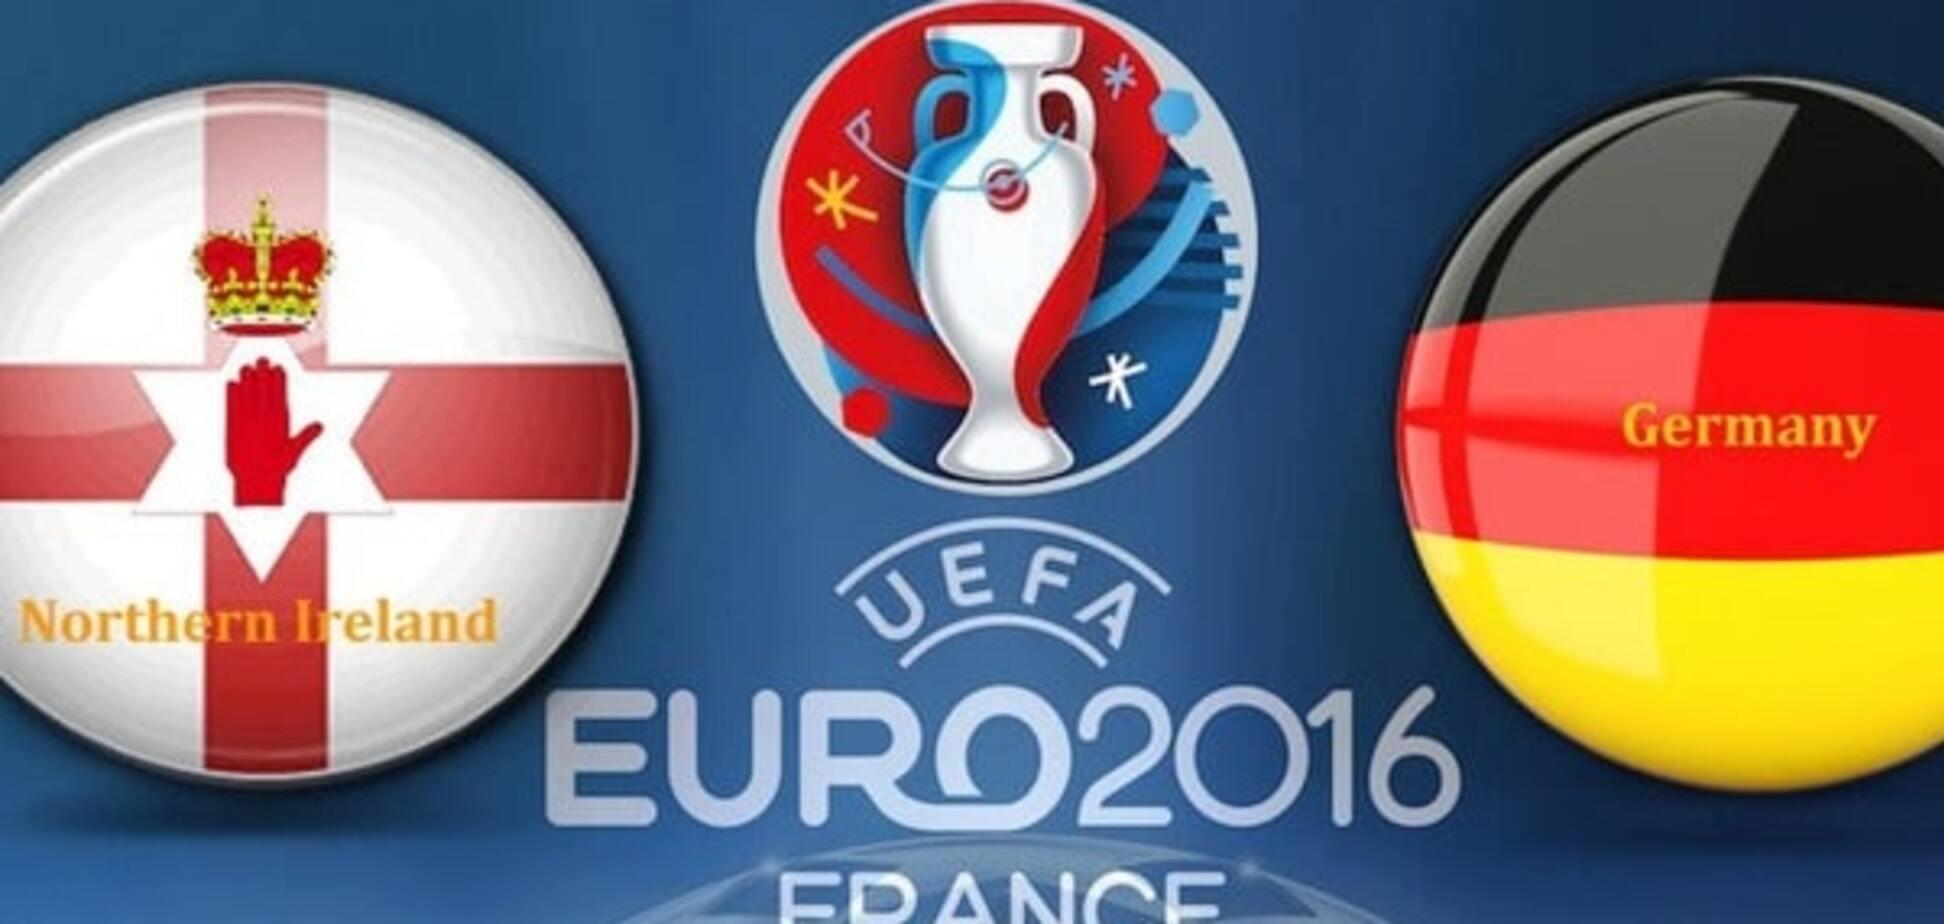 Северная Ирландия - Германия евро2016 онлайн